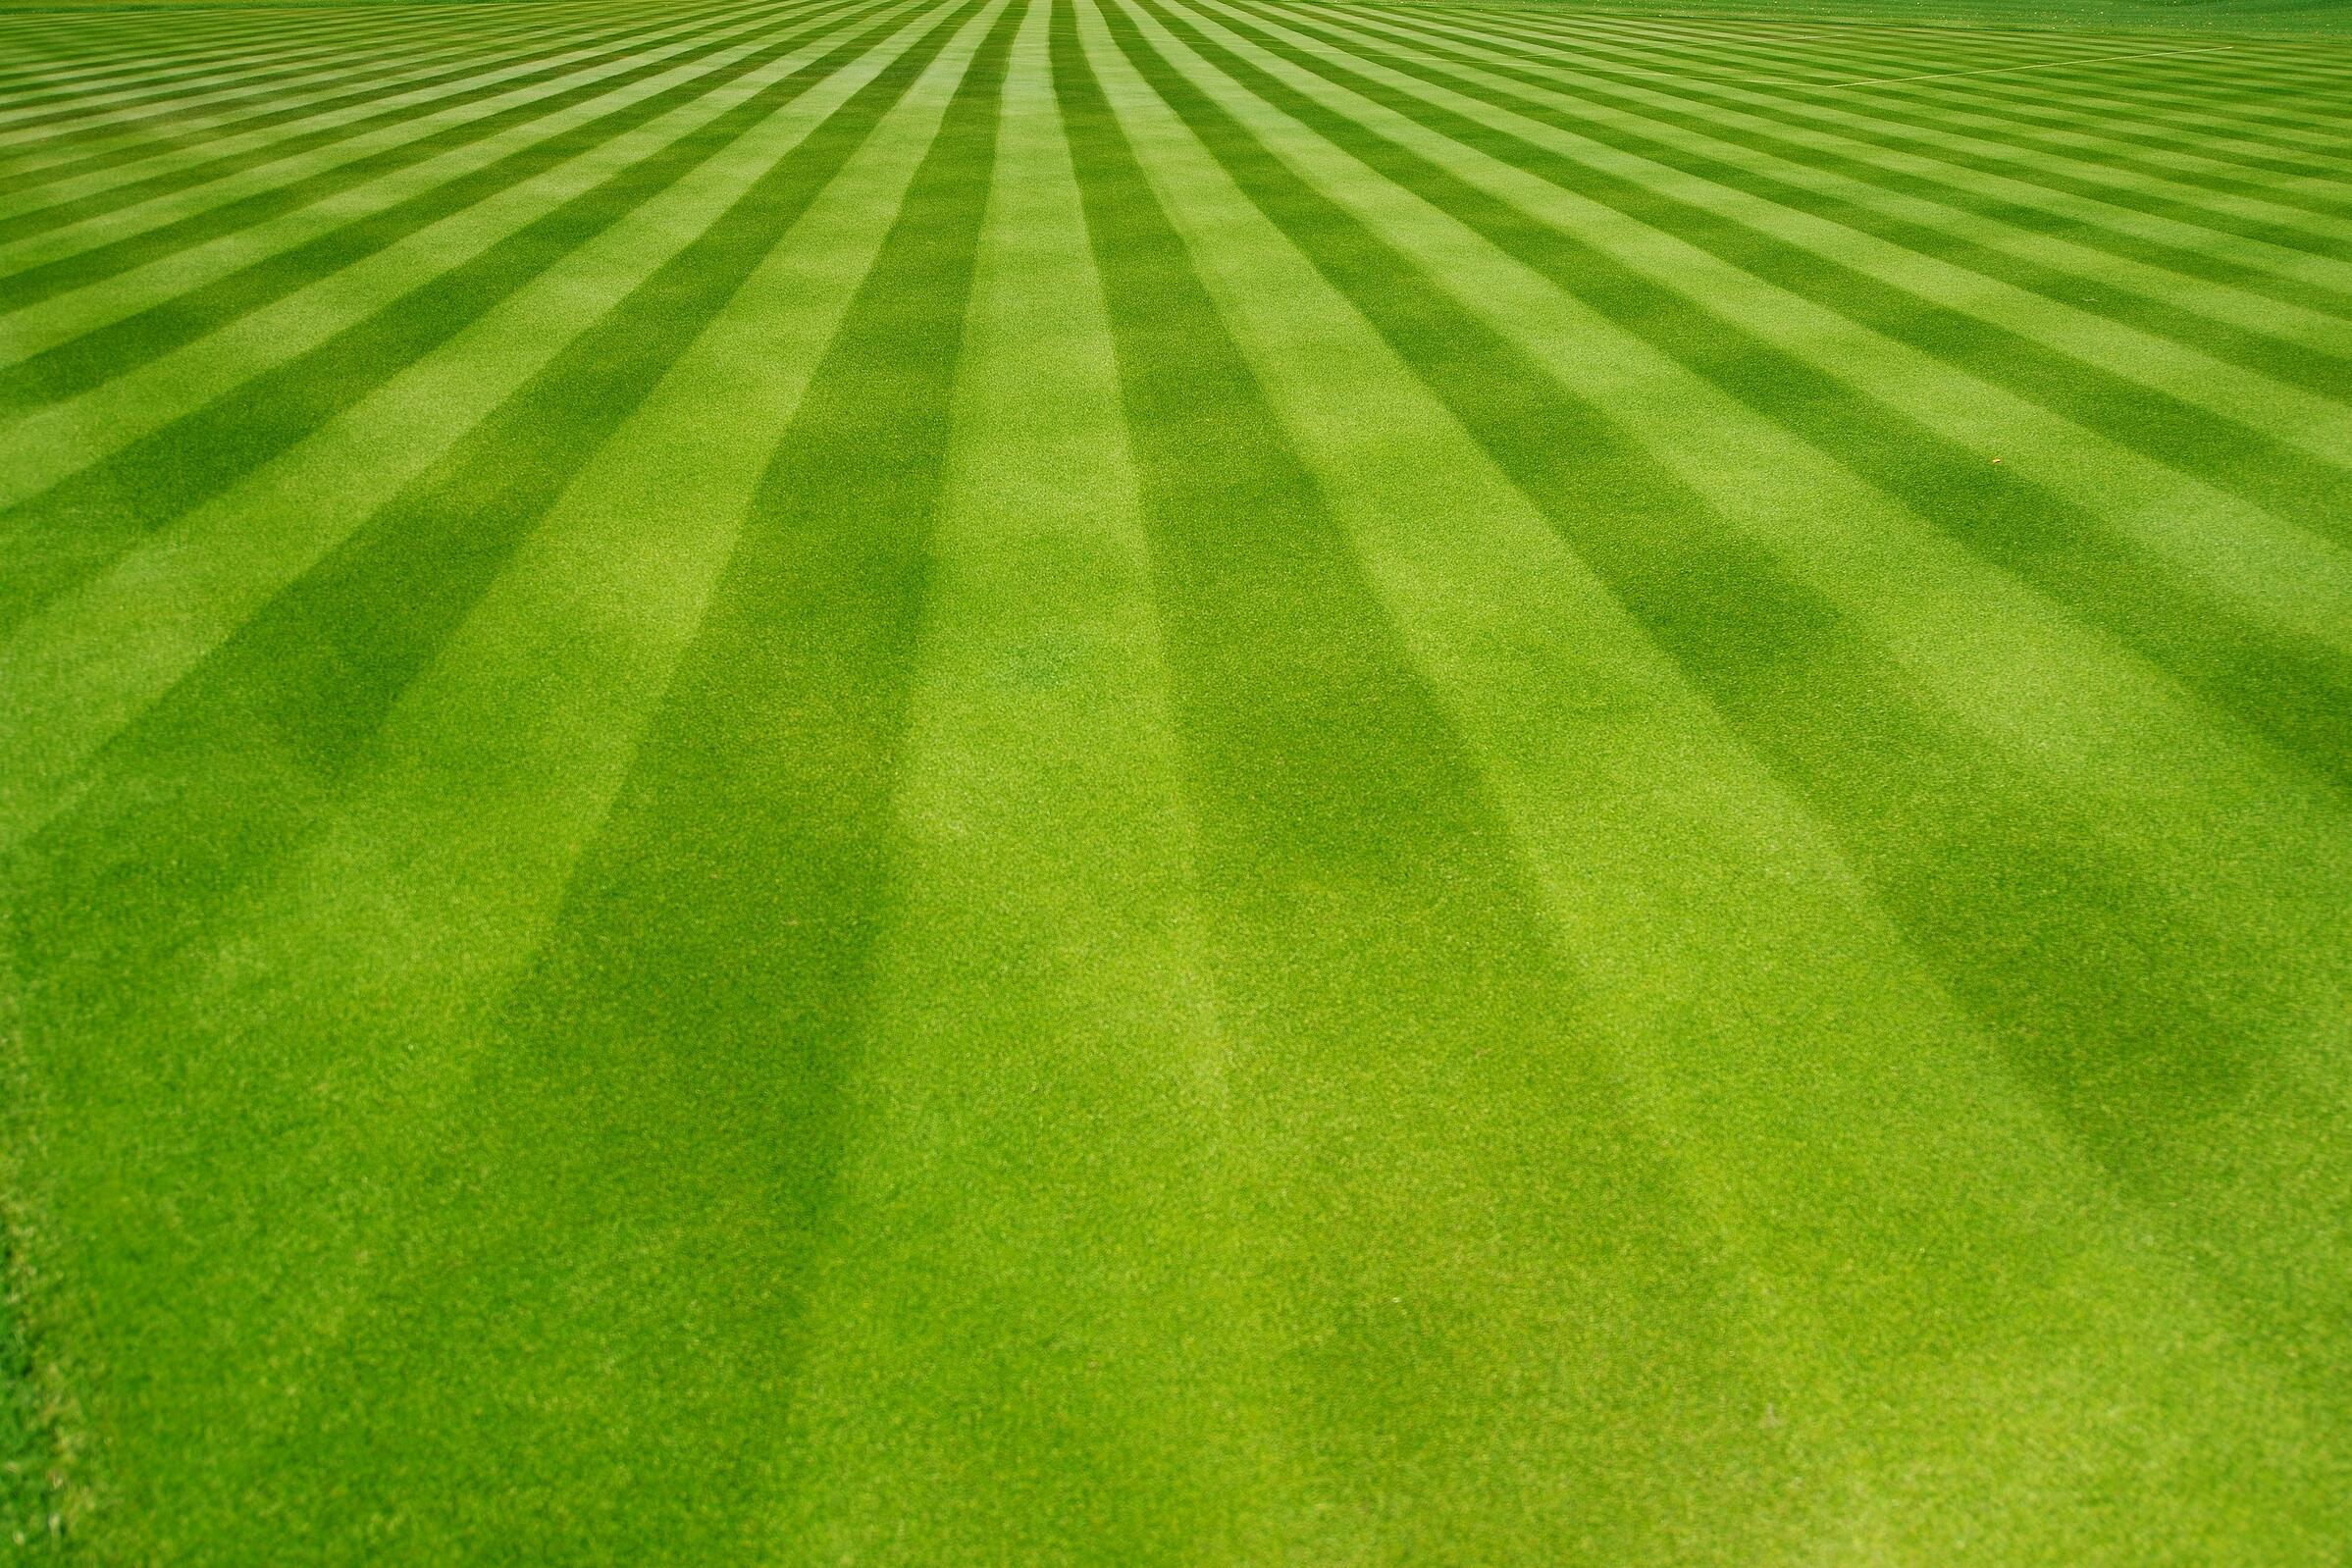 grass/lawn cutting